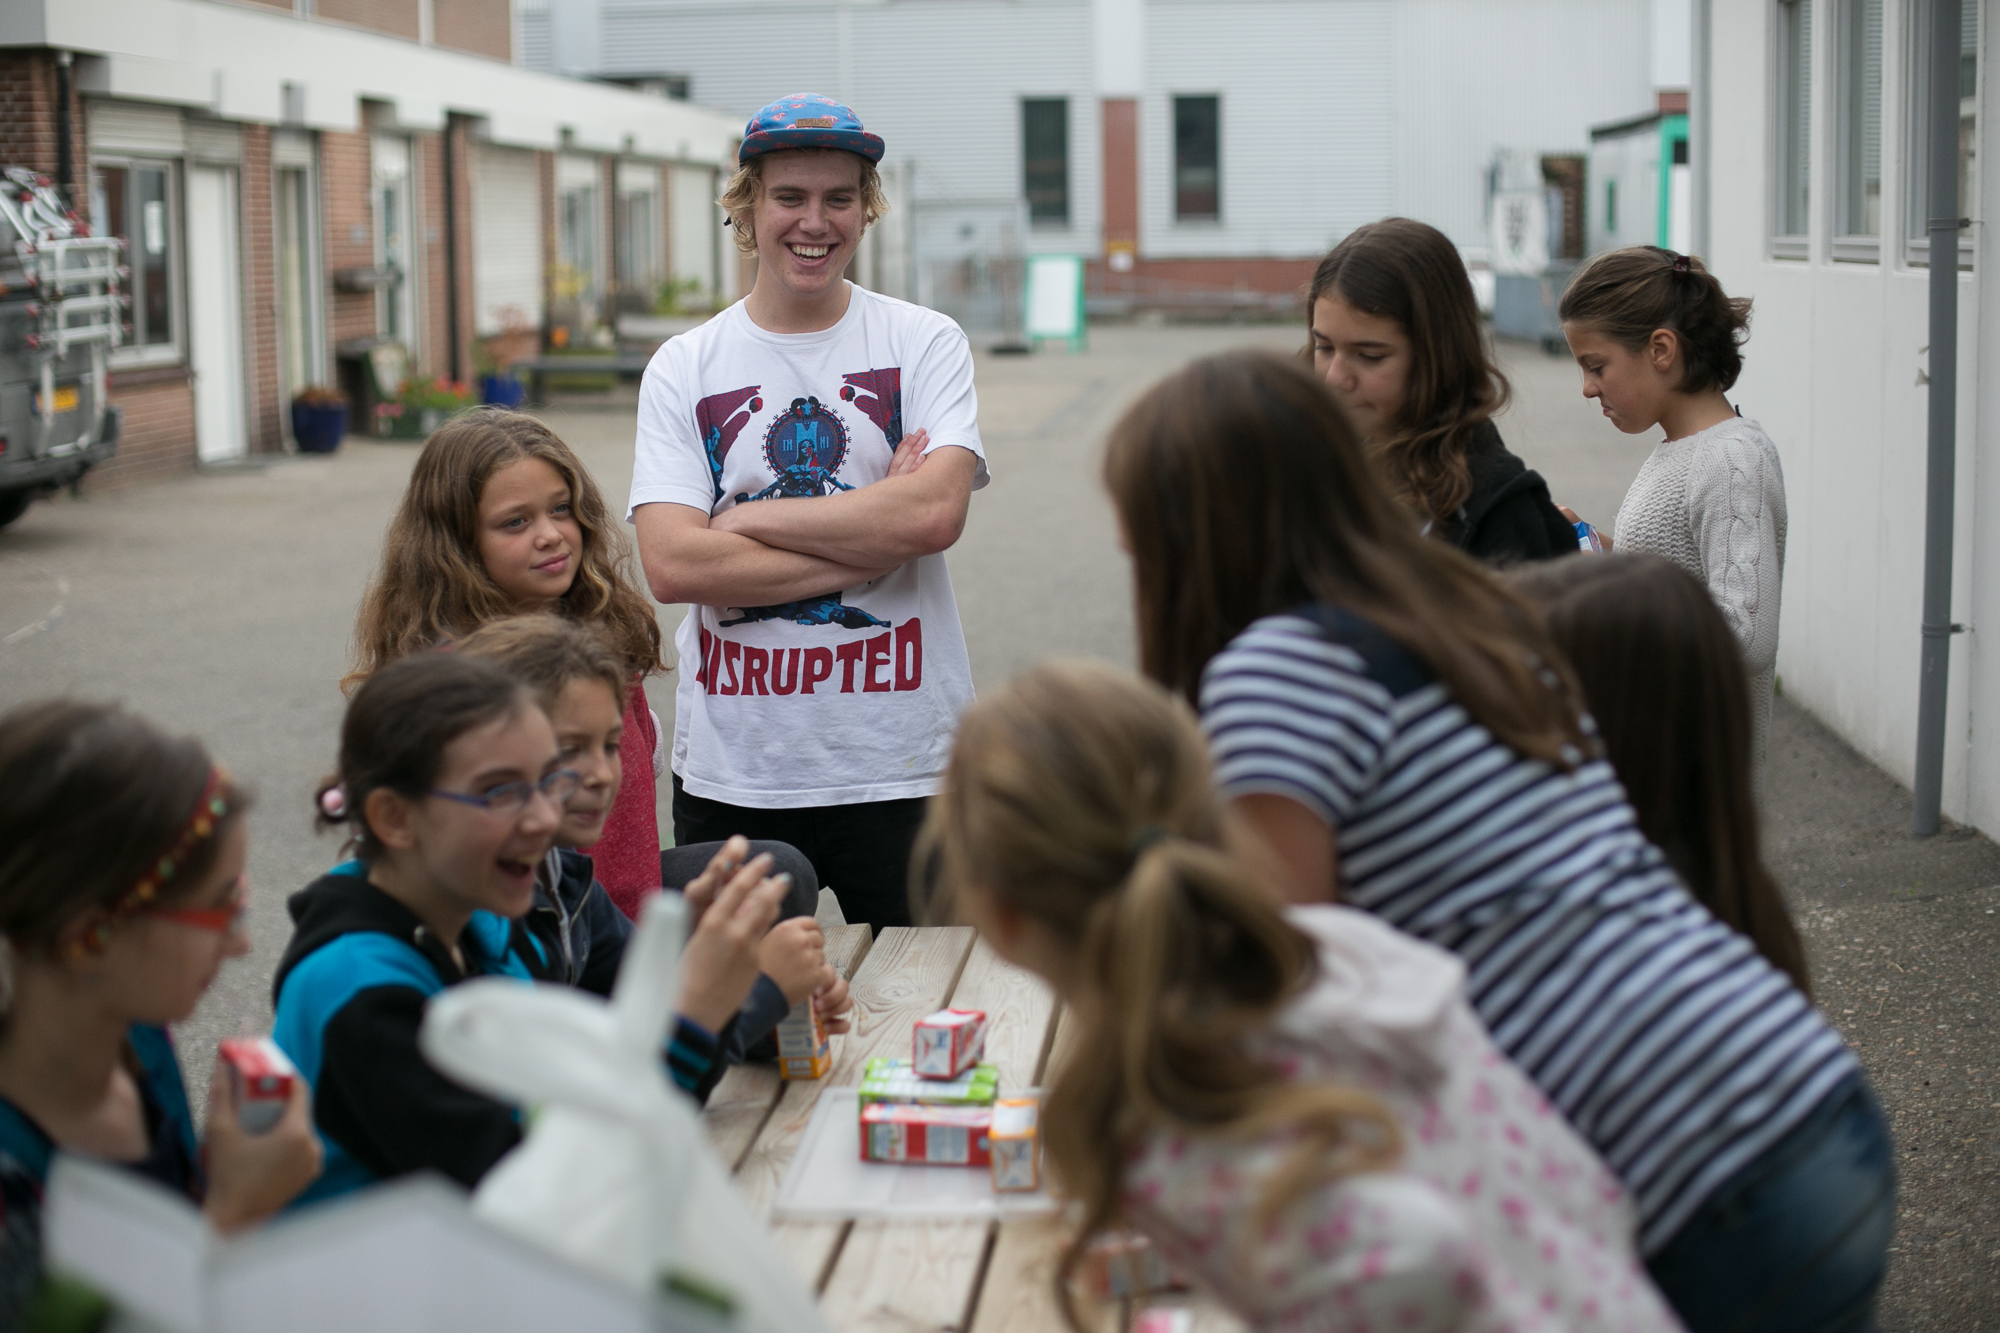 Graffitiworkshop Skatepark sweatshop Kinderfeestje Graffitiles den Haag 2015.jpg